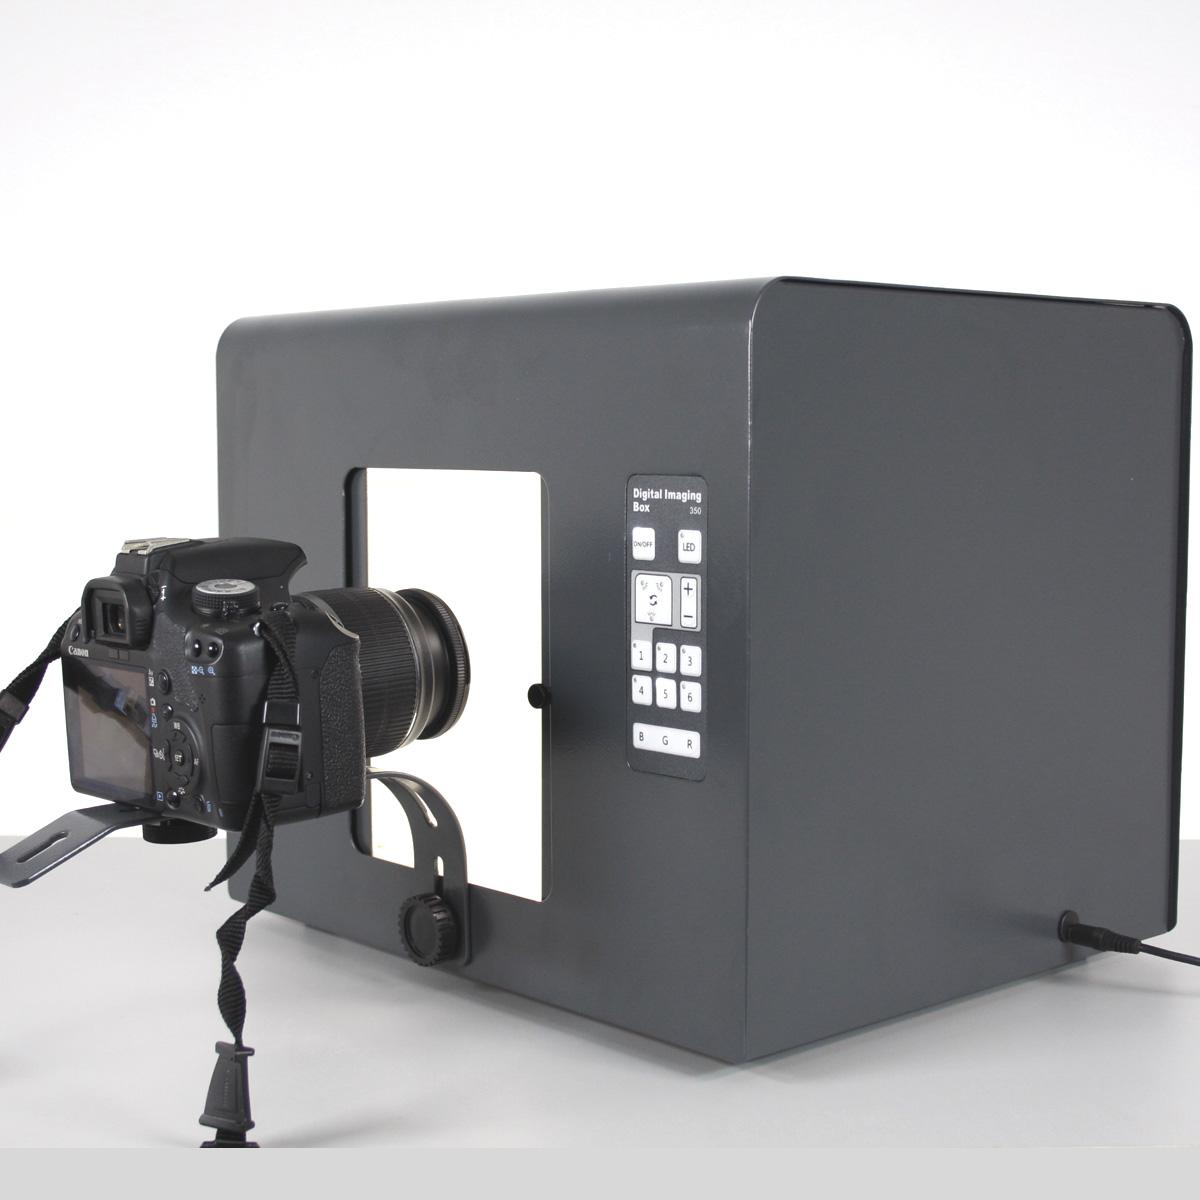 Sanoto B430 B350 B270 led المهنية المحمولة البسيطة الصور ستوديو ضوء مربع الفوتوغرافي softbox للمجوهرات الماس